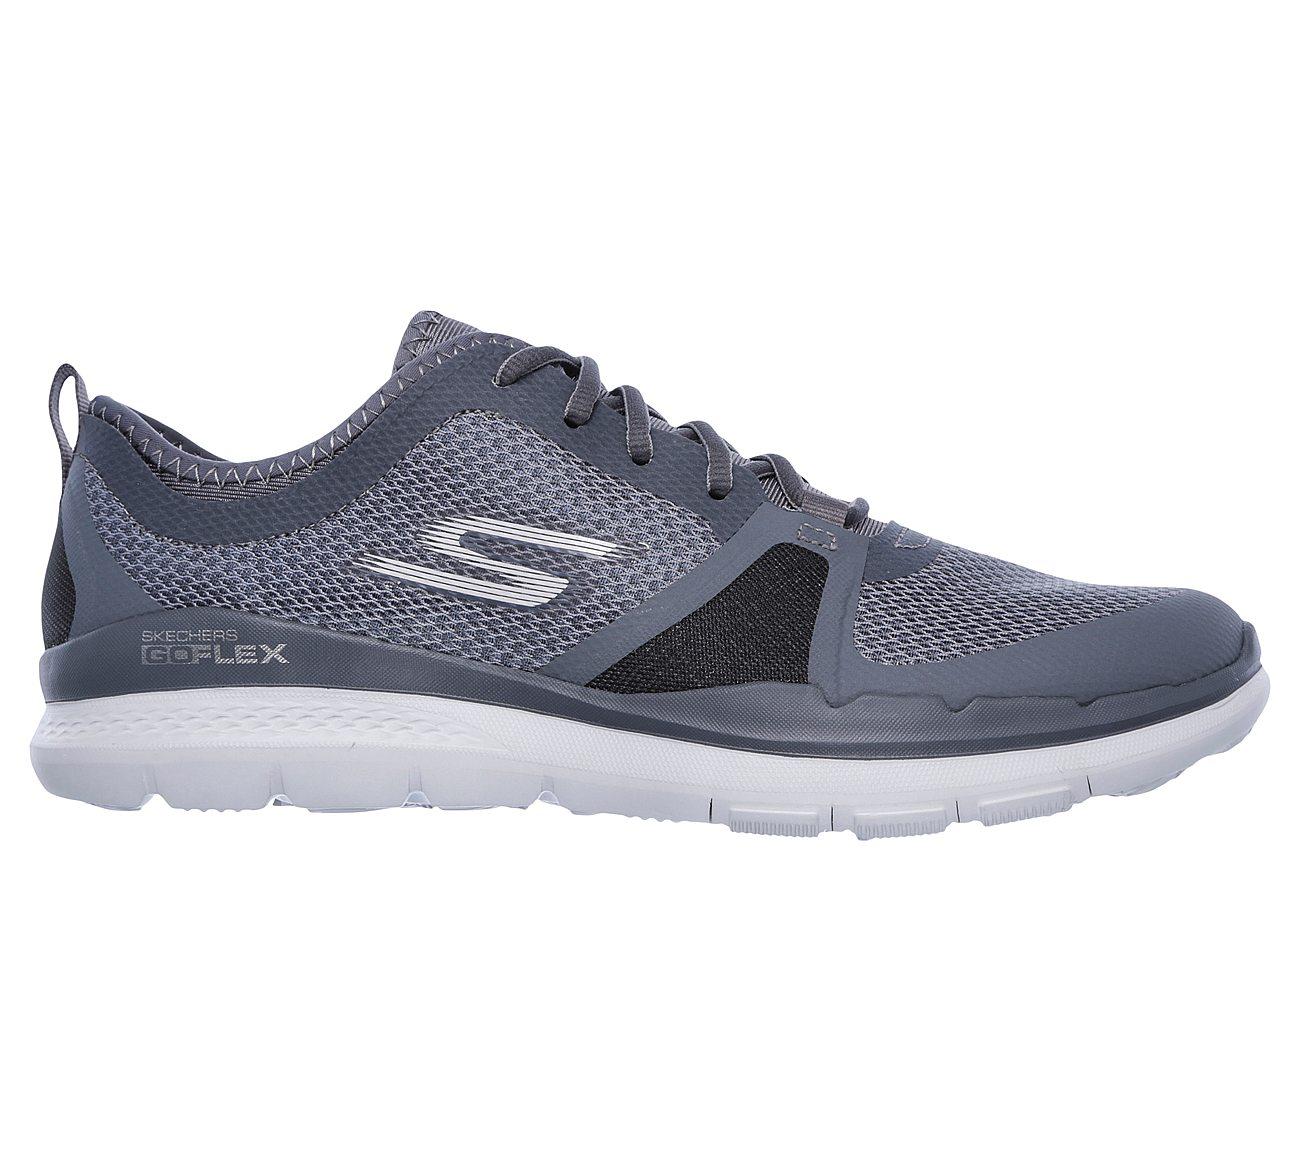 Womens Athletic Shoes skechers performance gray black go flex rx3f80h8